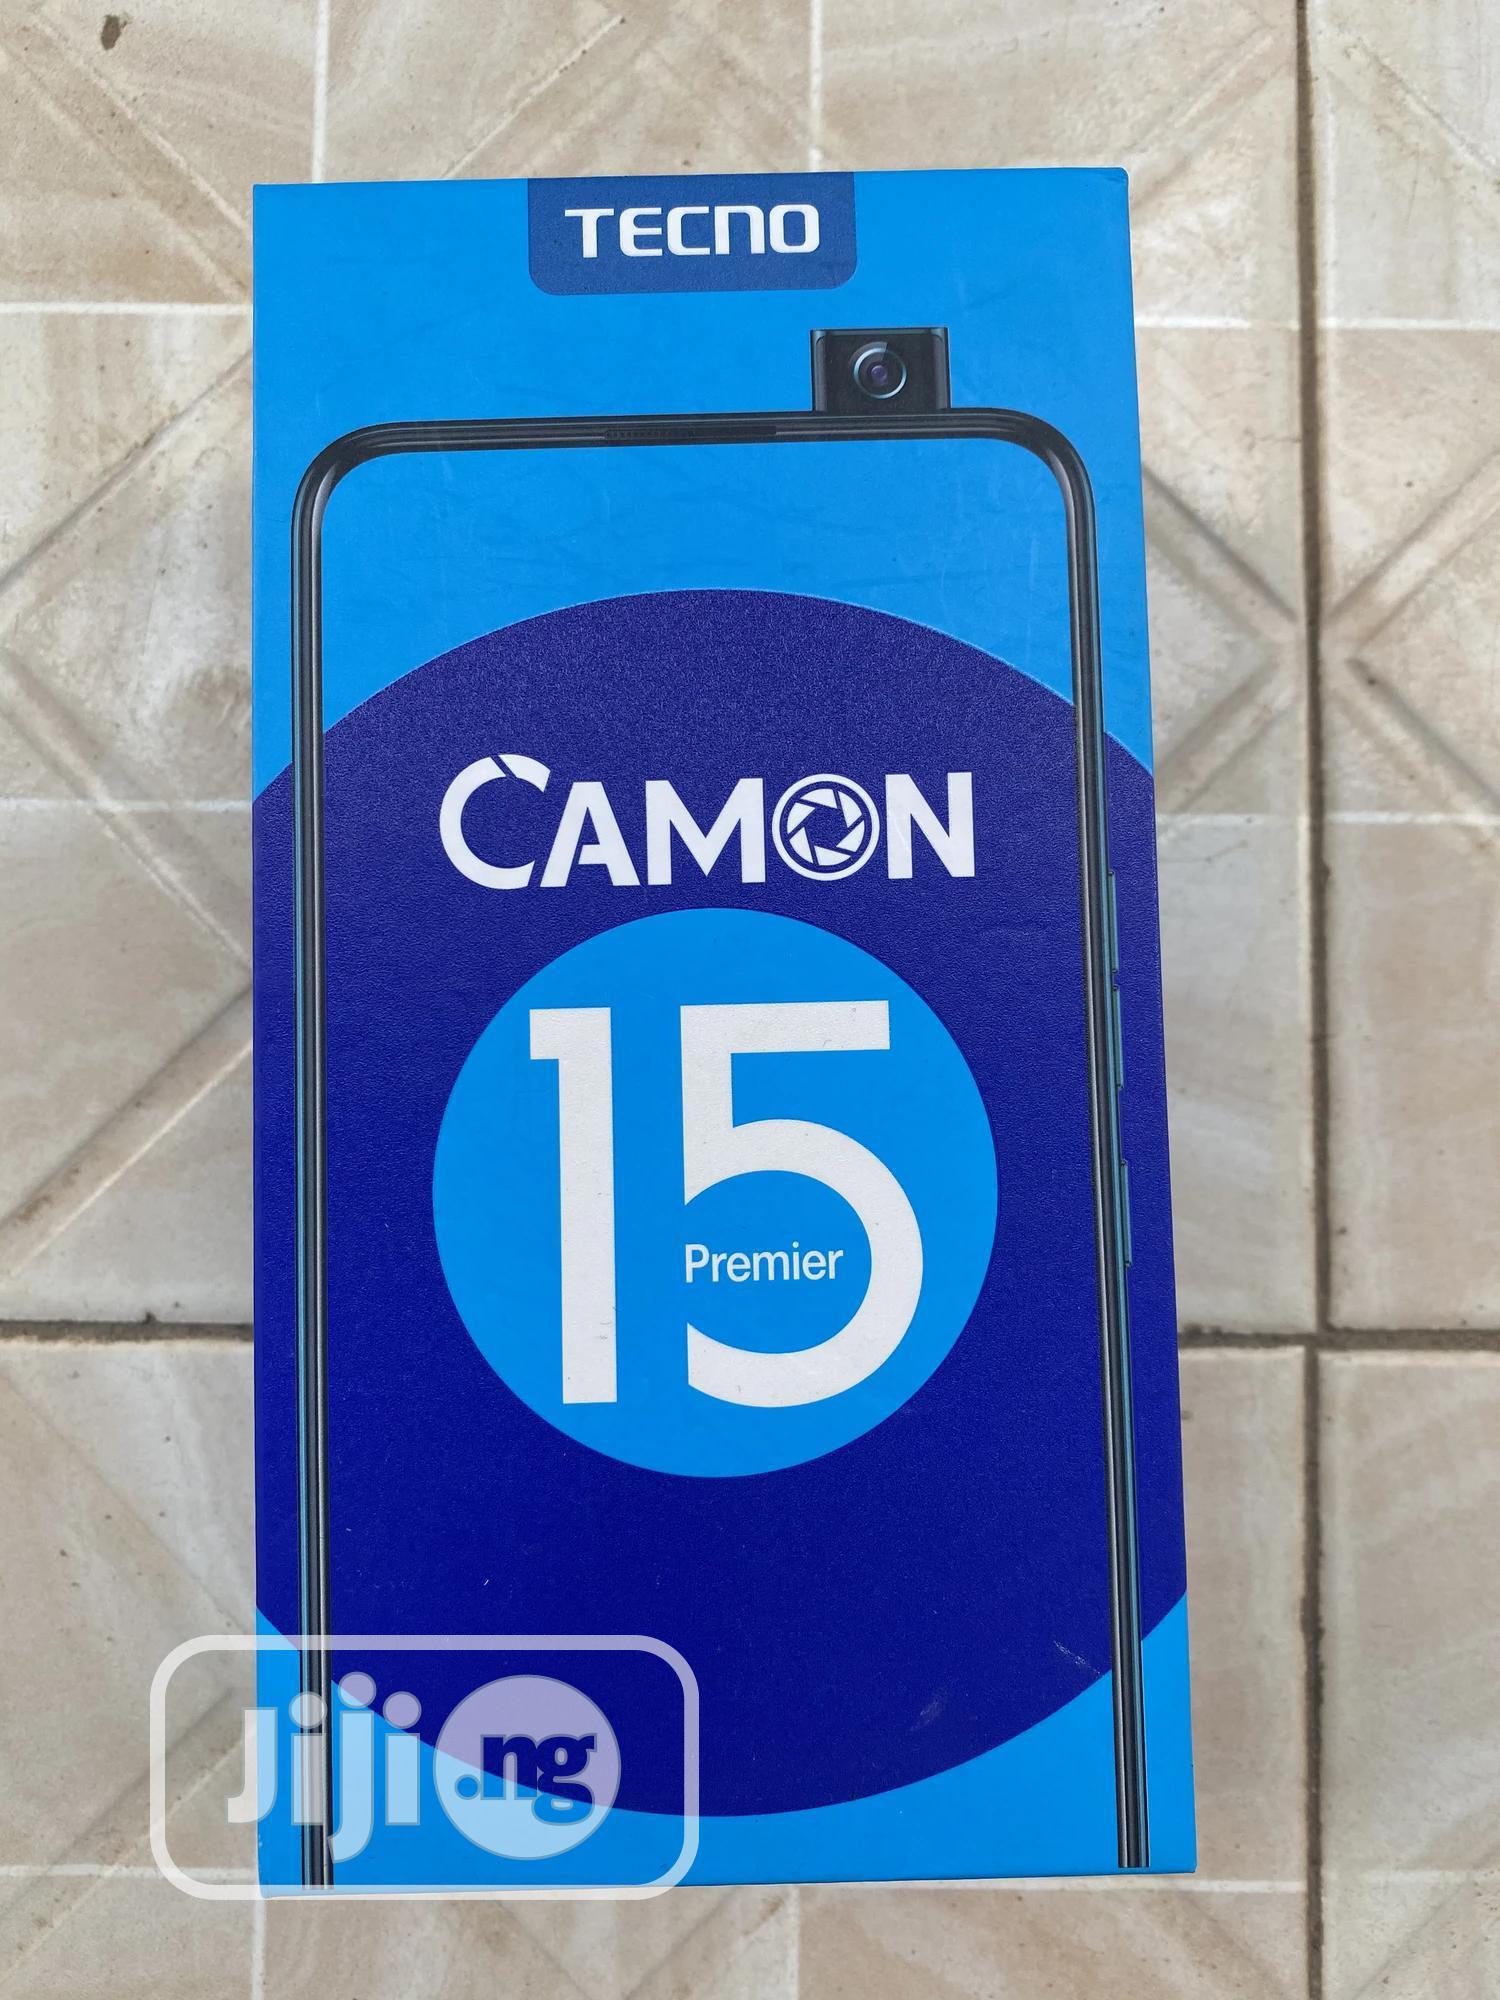 New Tecno Camon 15 Premier 128 GB | Mobile Phones for sale in Ilorin South, Kwara State, Nigeria